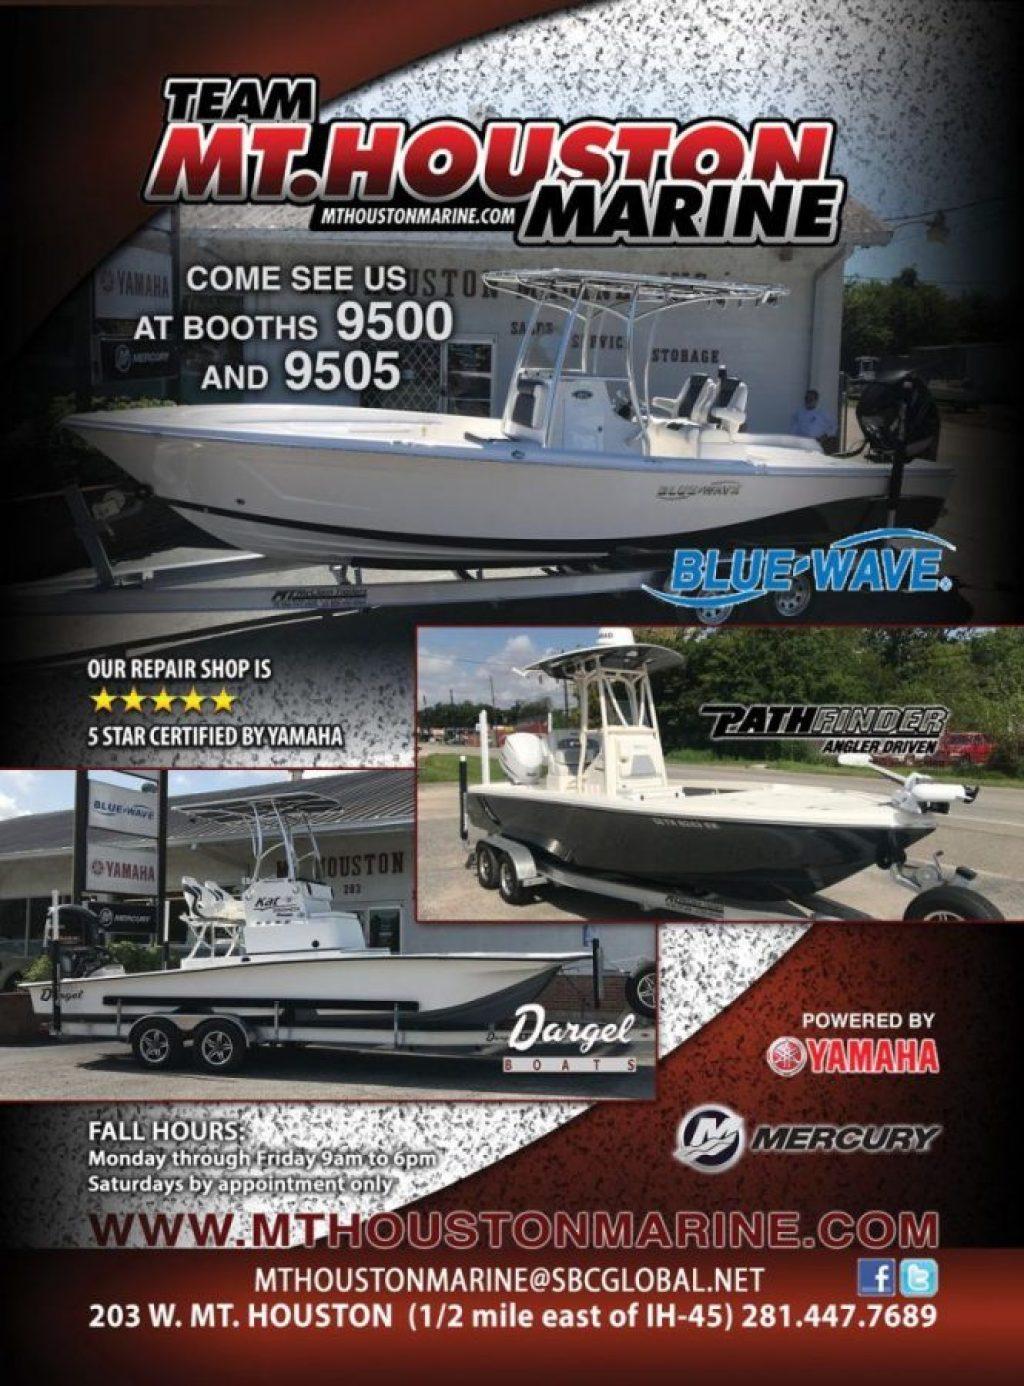 MT Houston Marine